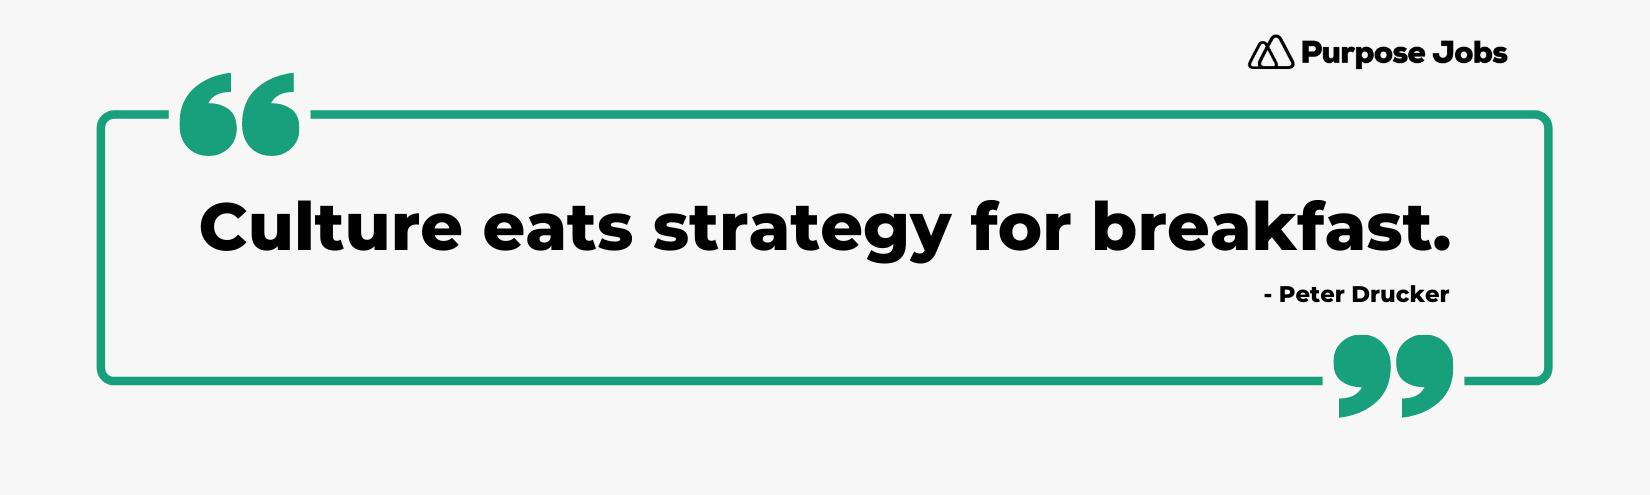 Culture eats strategy for breakfast.